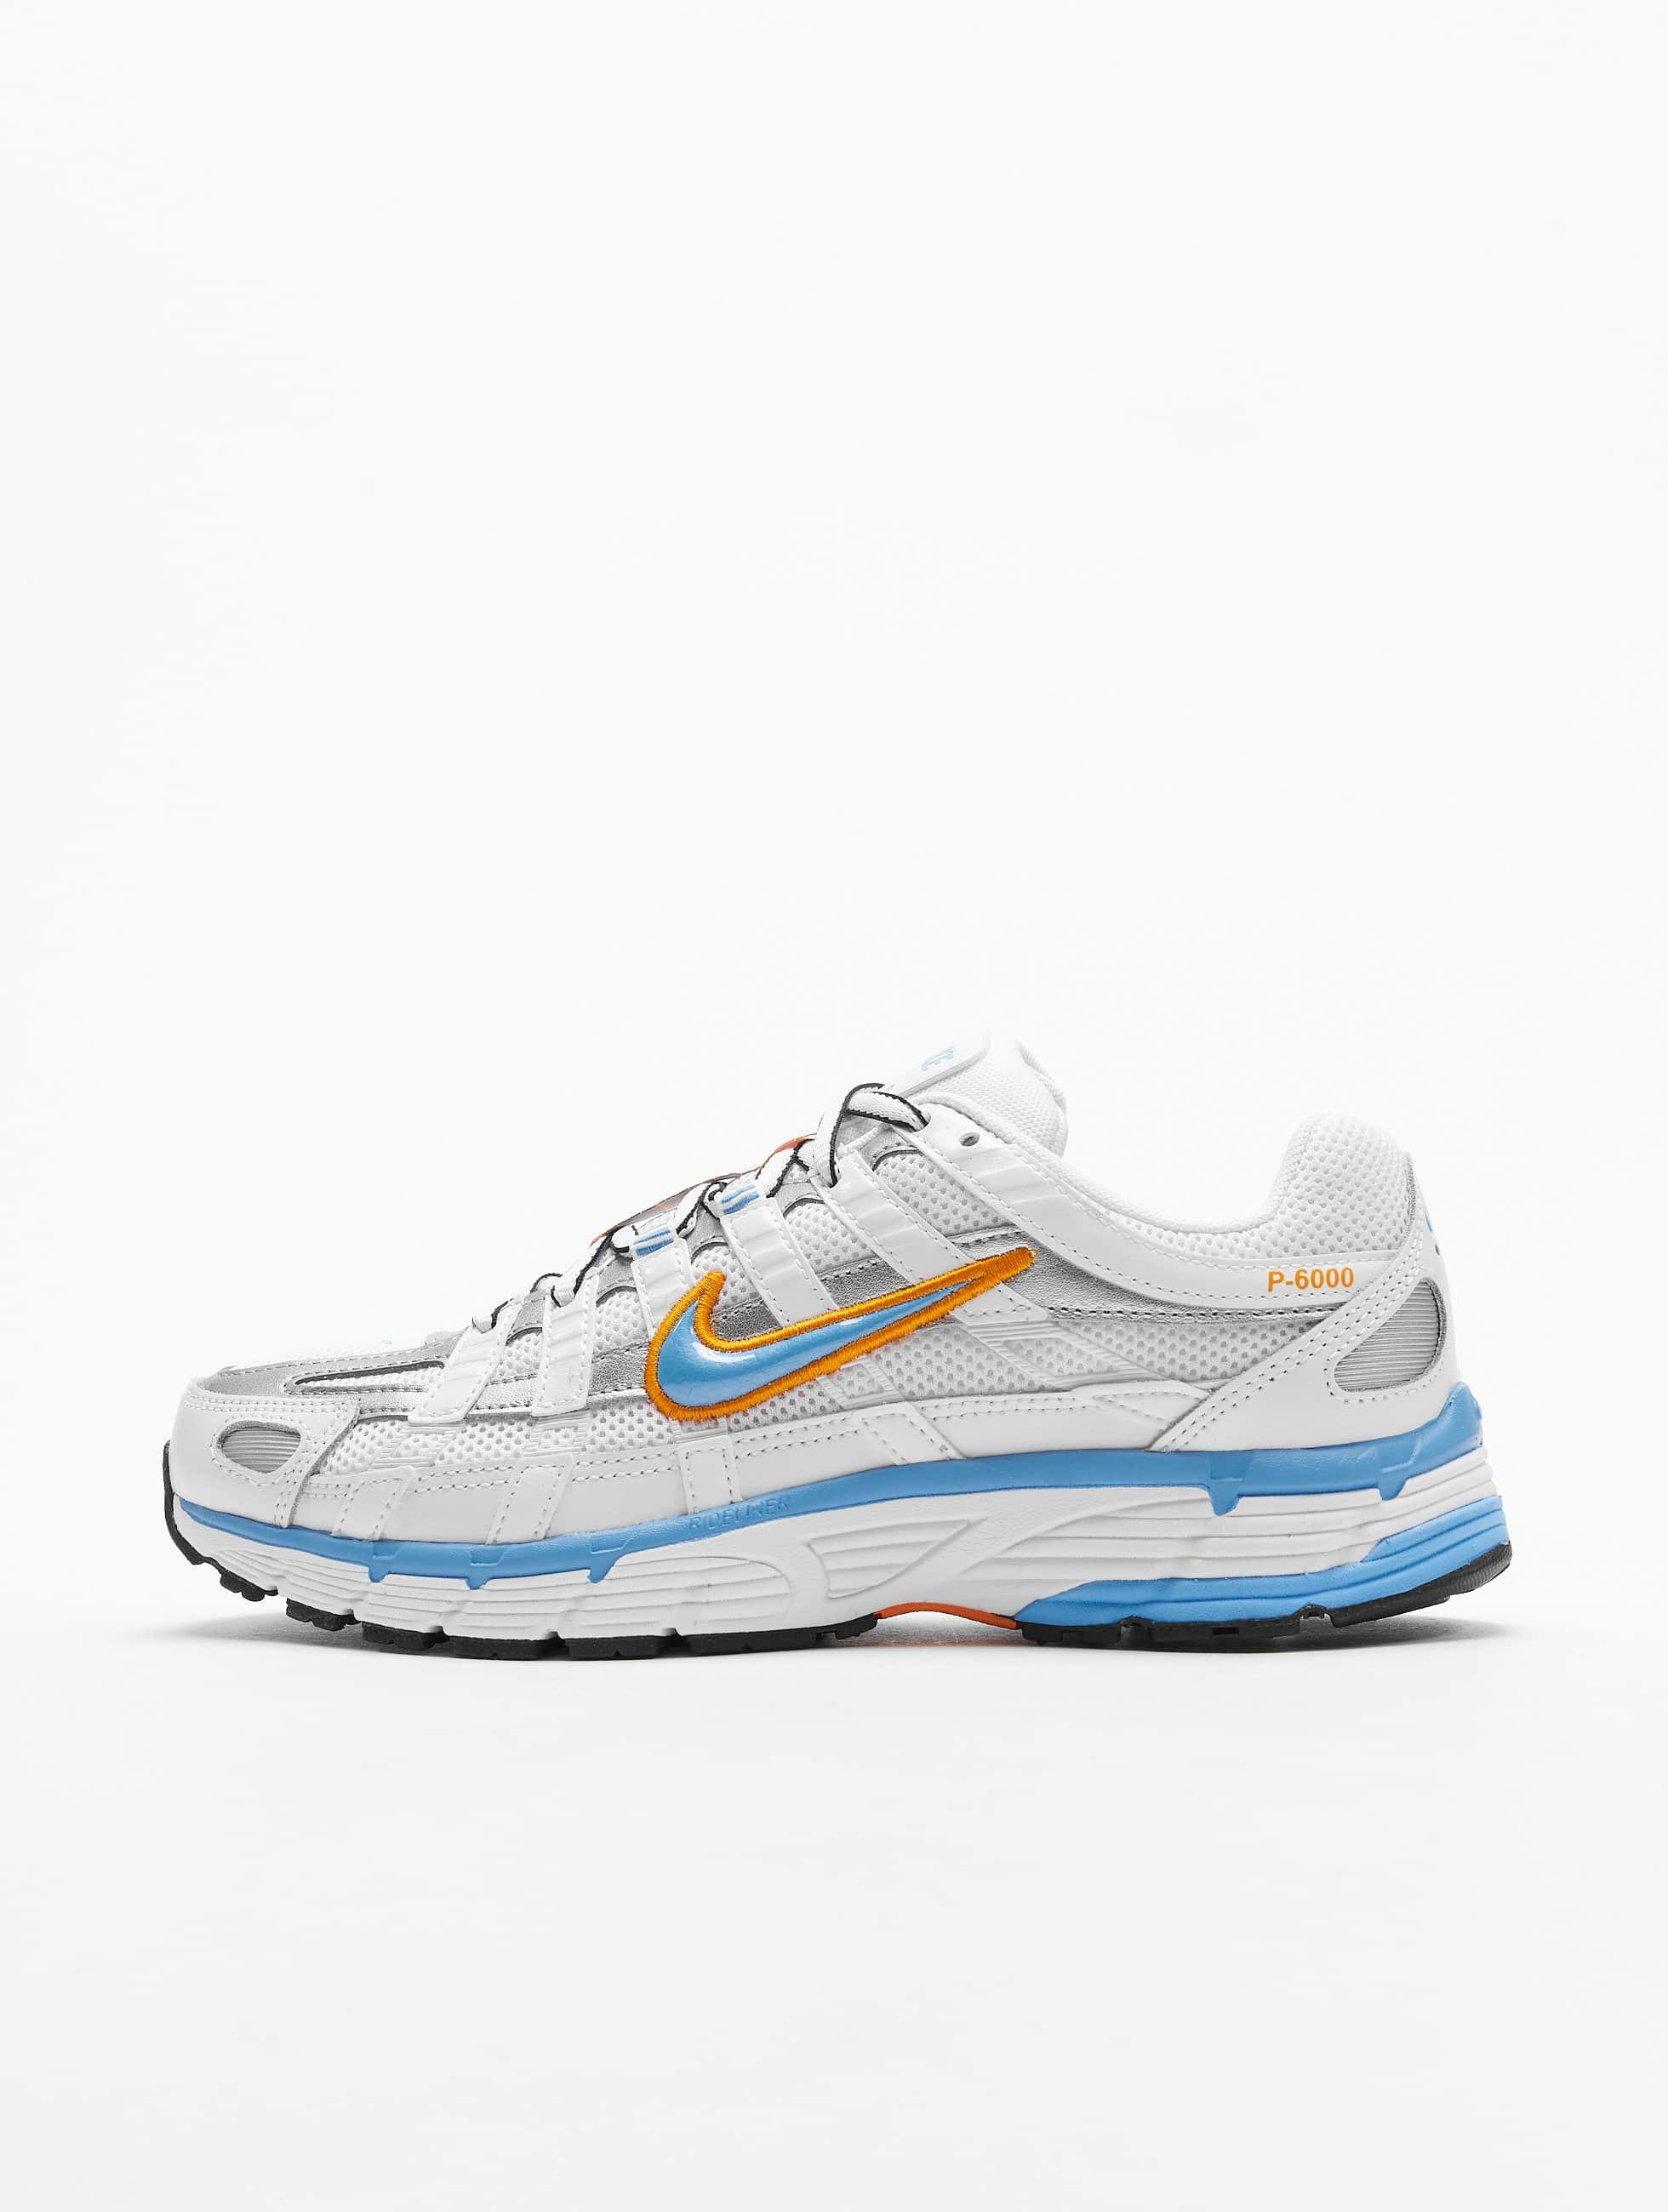 Nike P 6000 Sneakers WhiteUniversity BlueMetallic Silvern